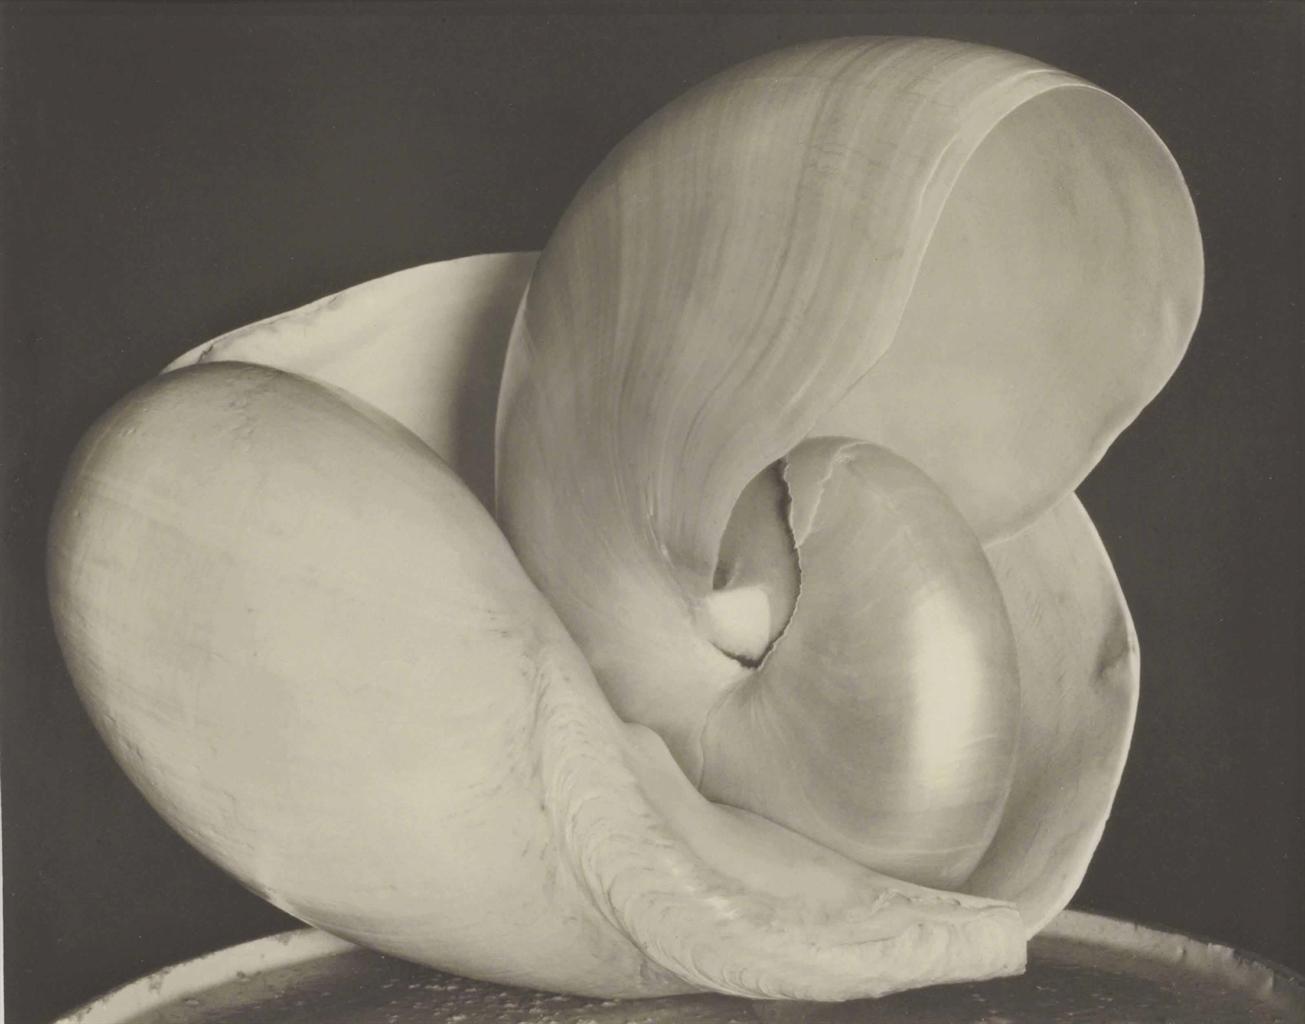 Edward Weston-Shells, 6S-1927